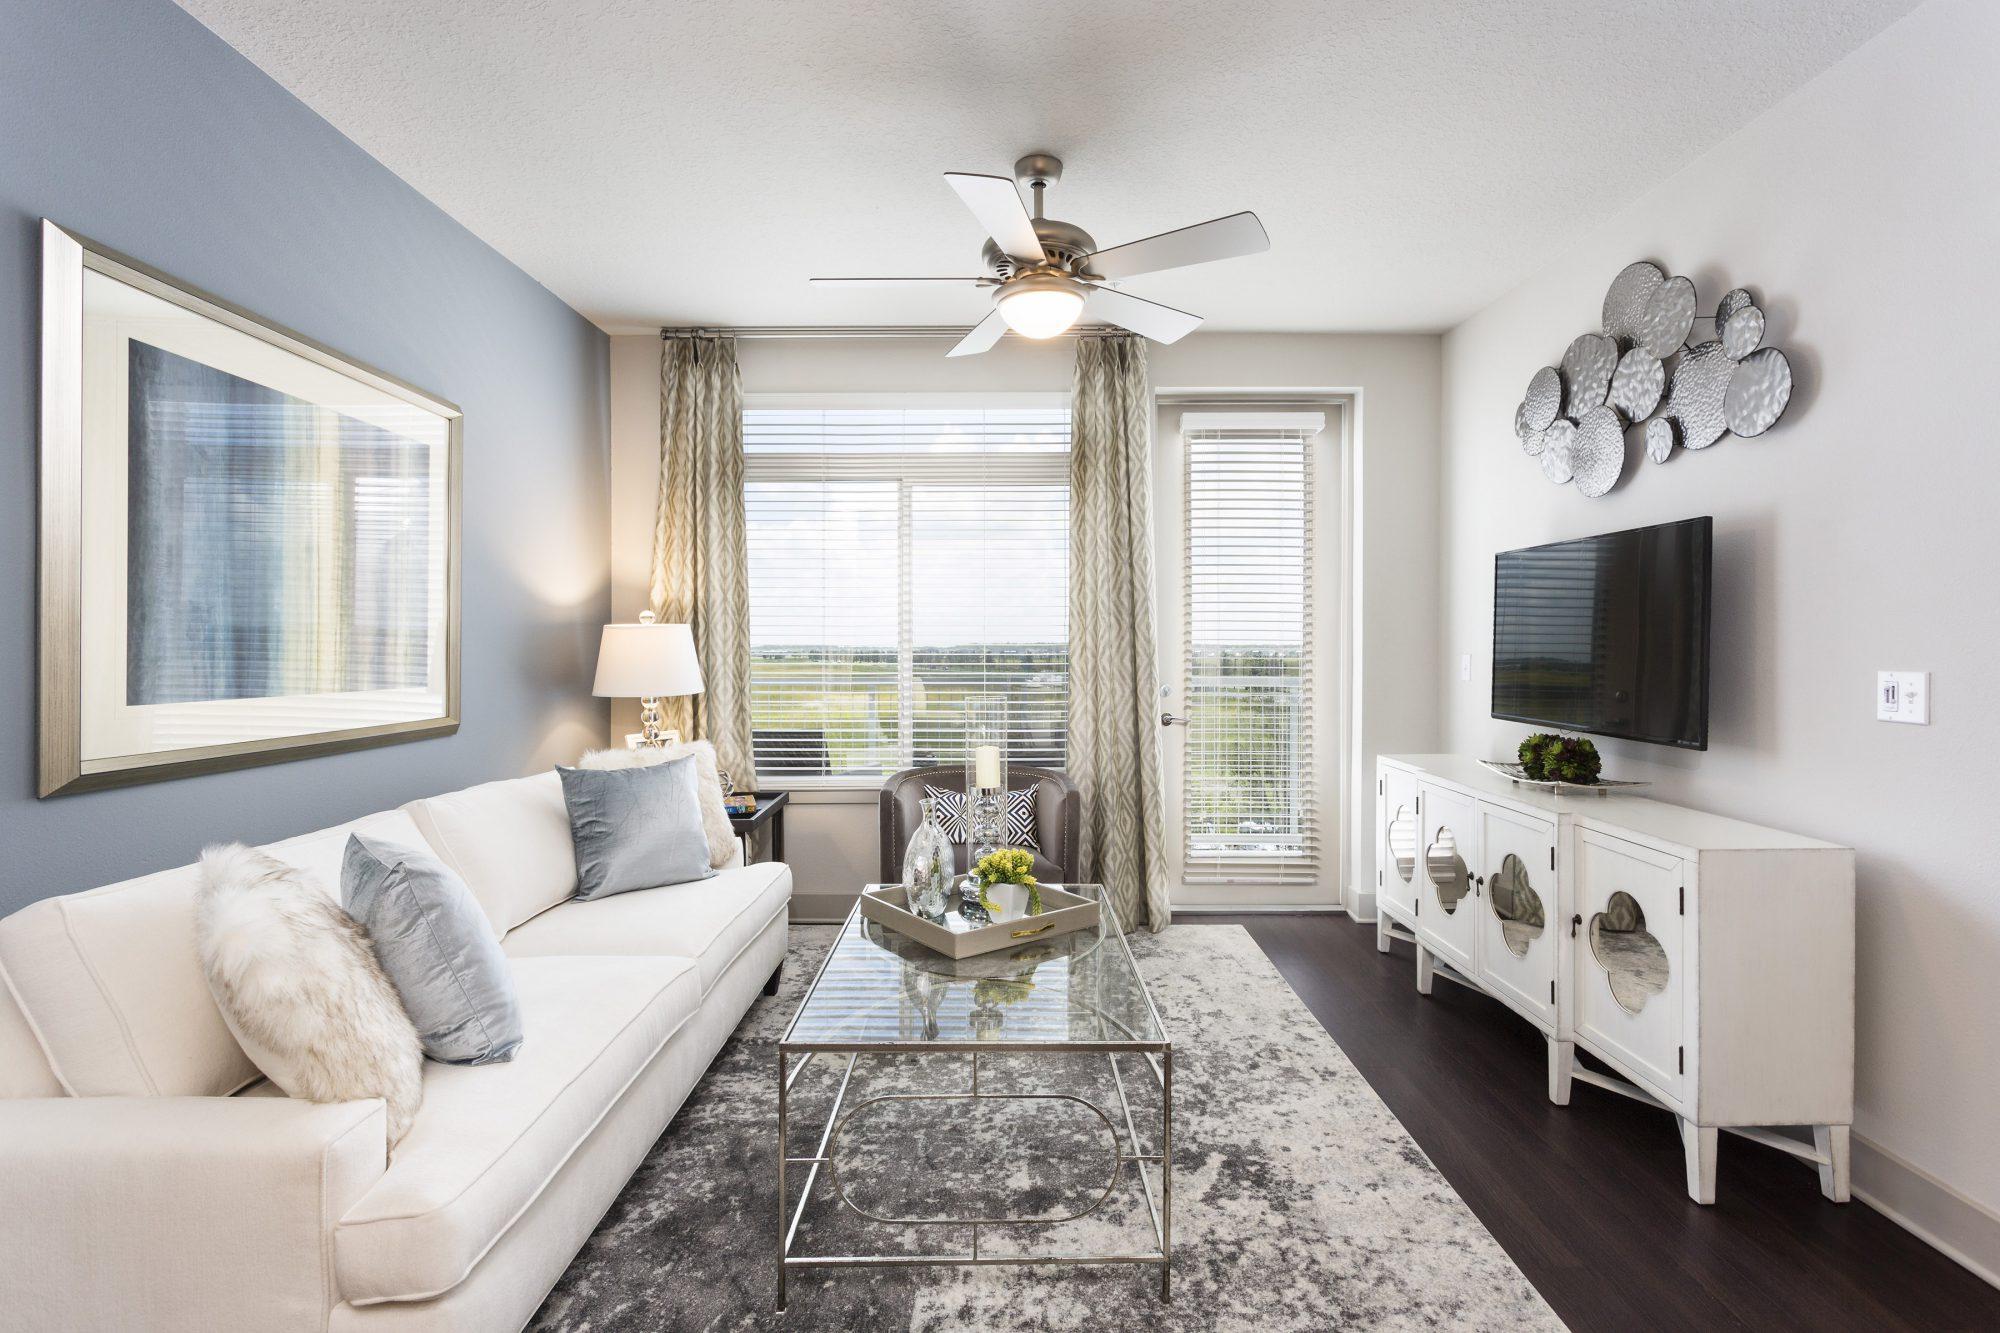 LandonHouse Apartments 3